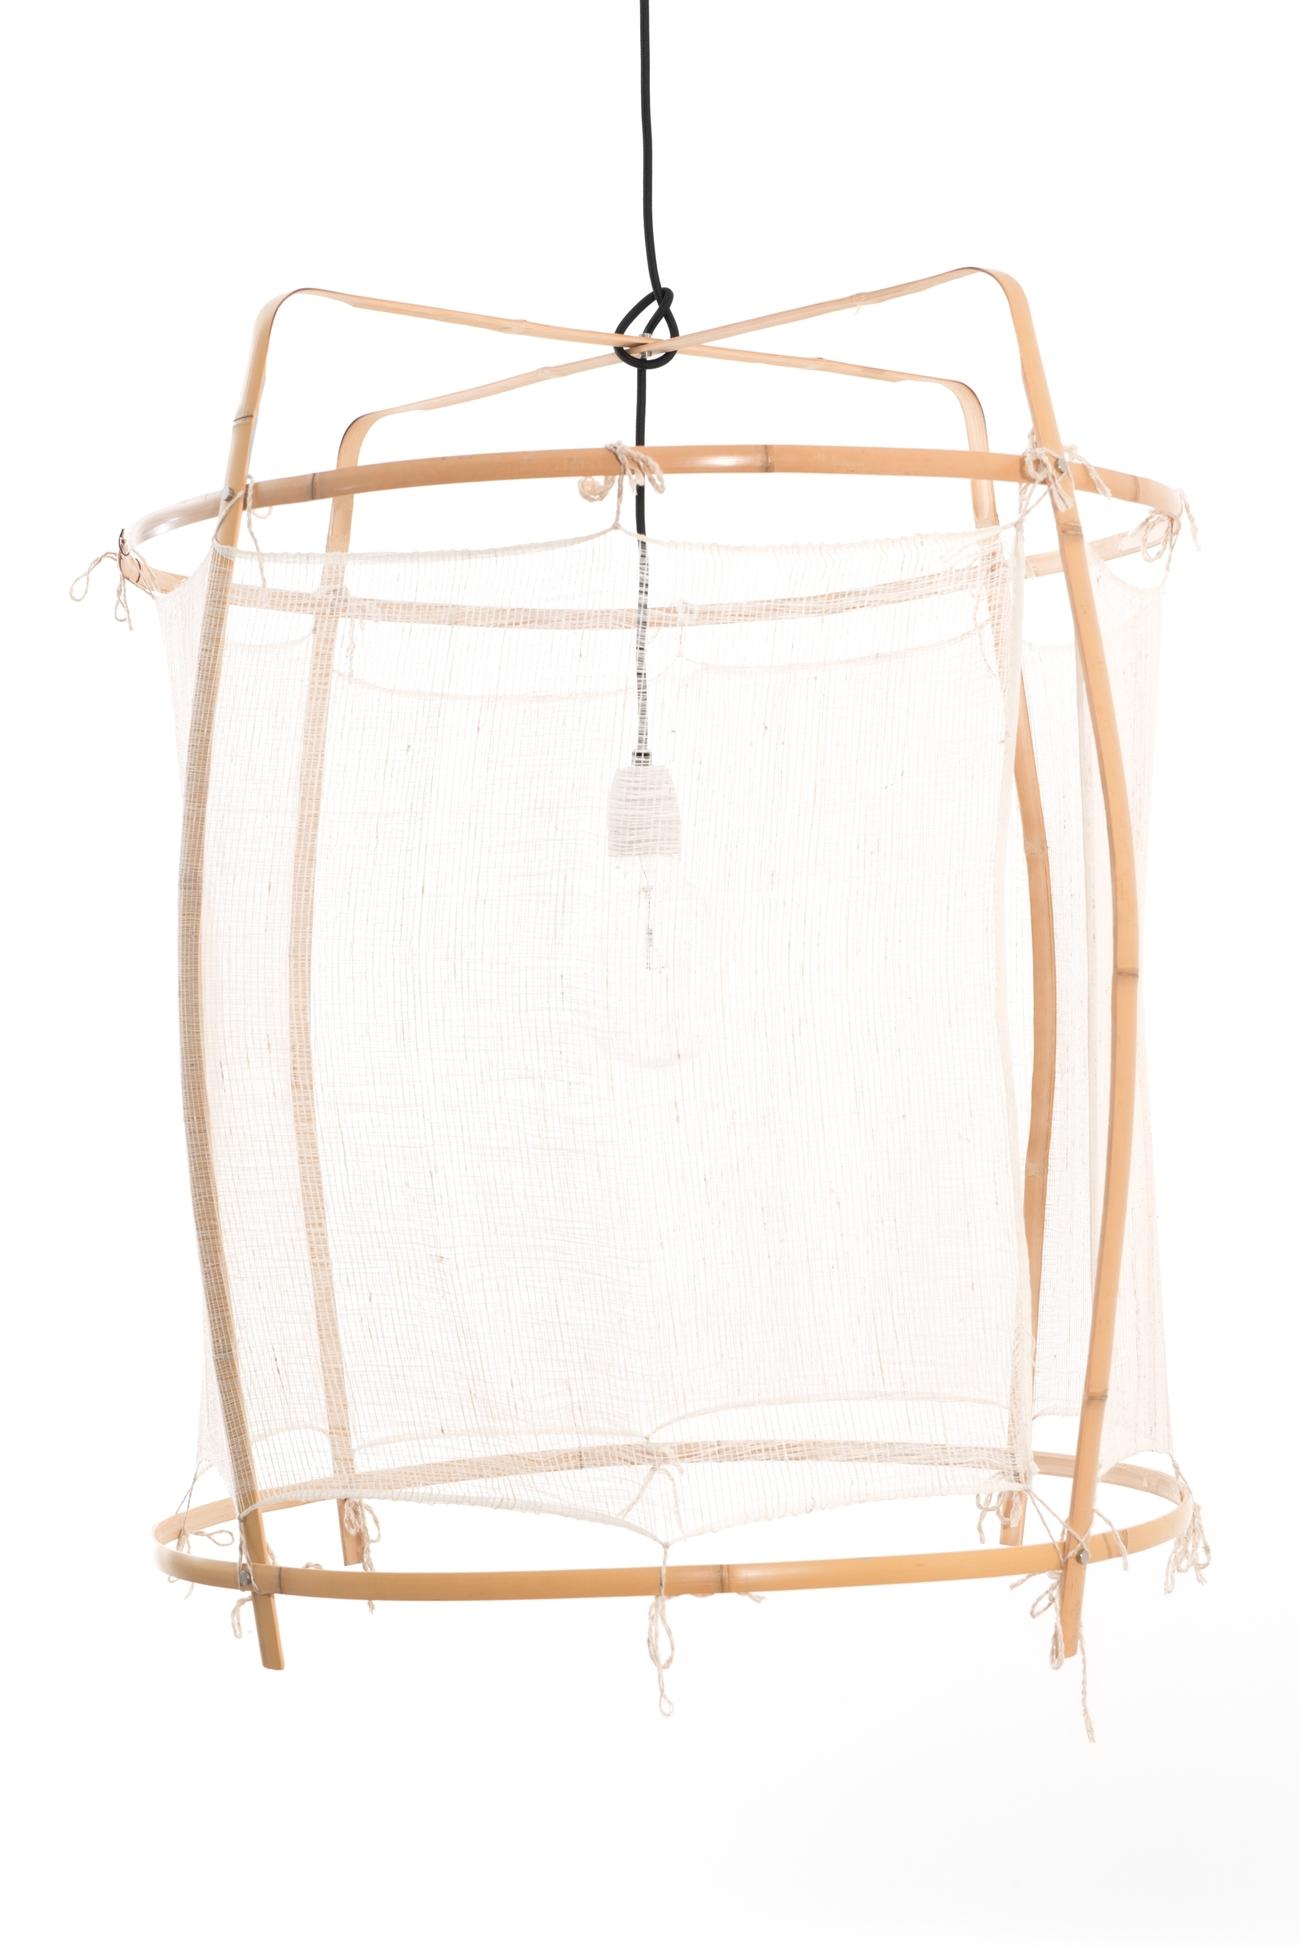 Ay illuminate Z2.5 Blonde Silk hanglamp